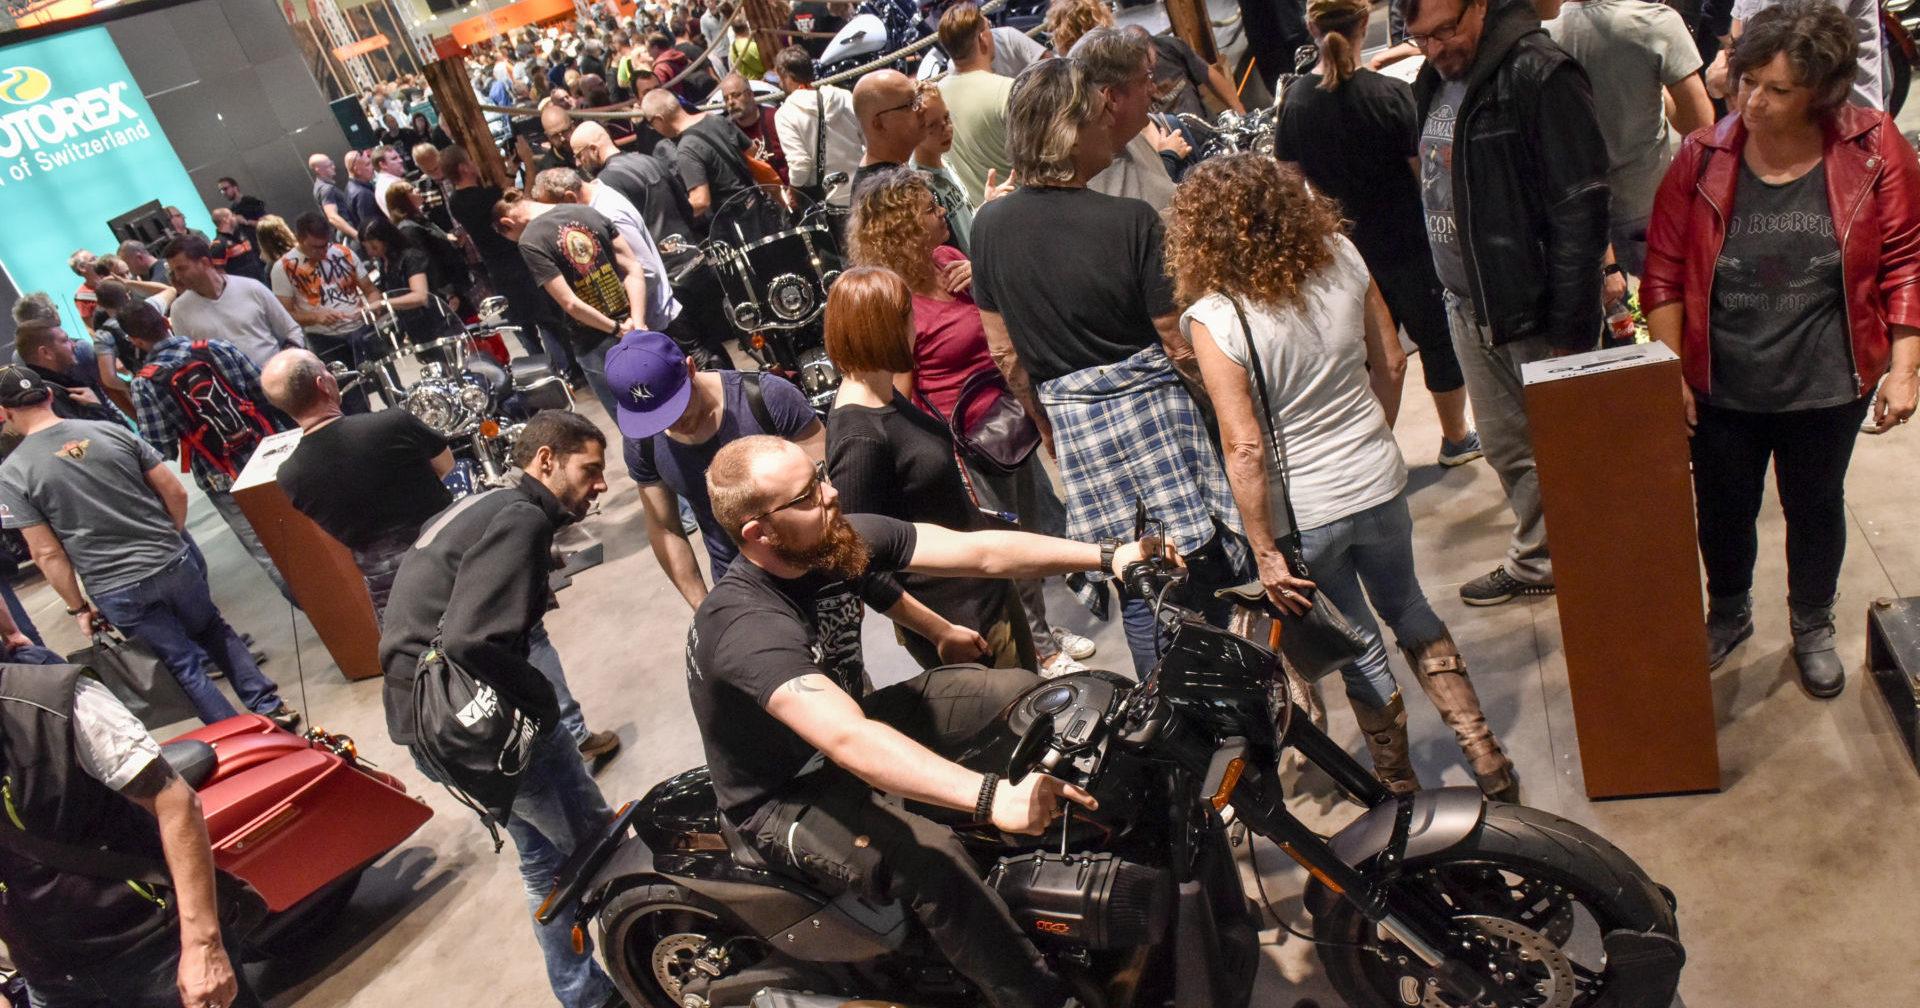 Fans at a previous INTERMOT Show. Photo courtesy Koelnmesse / INTERMOT.